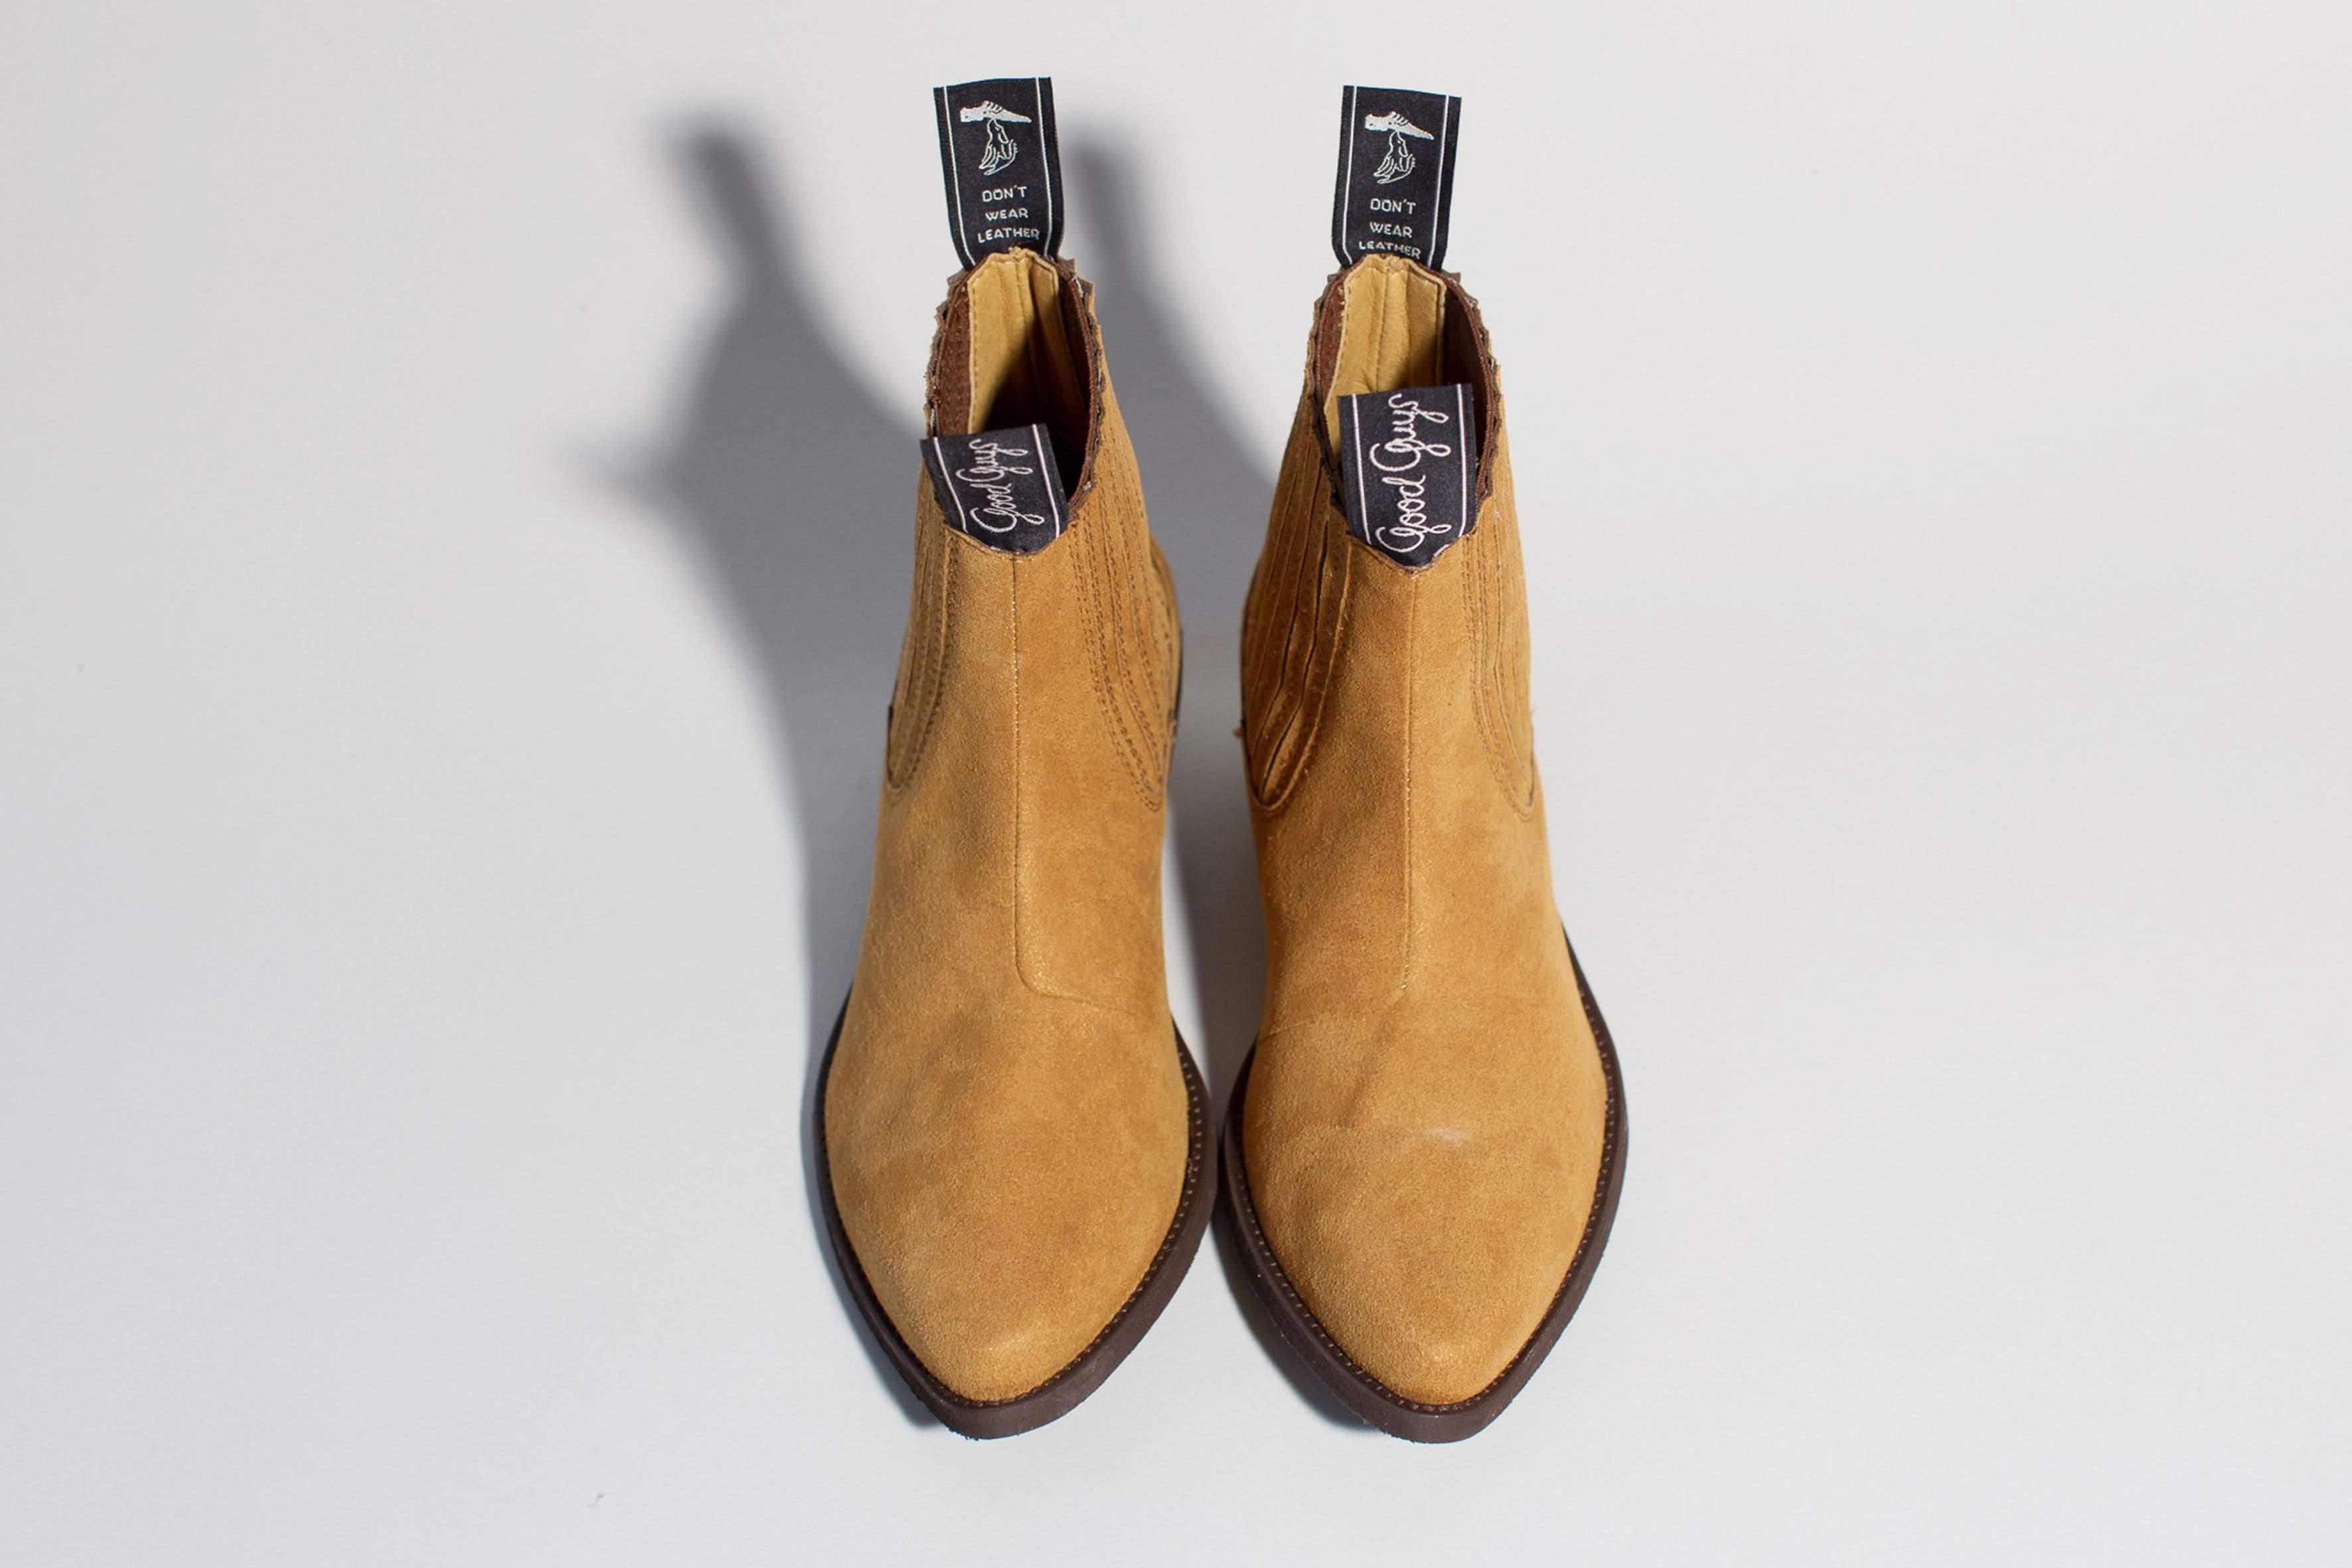 Good Guys Don't Wear Leather Duke Vegan Suede Cowboy Boots   Mustard